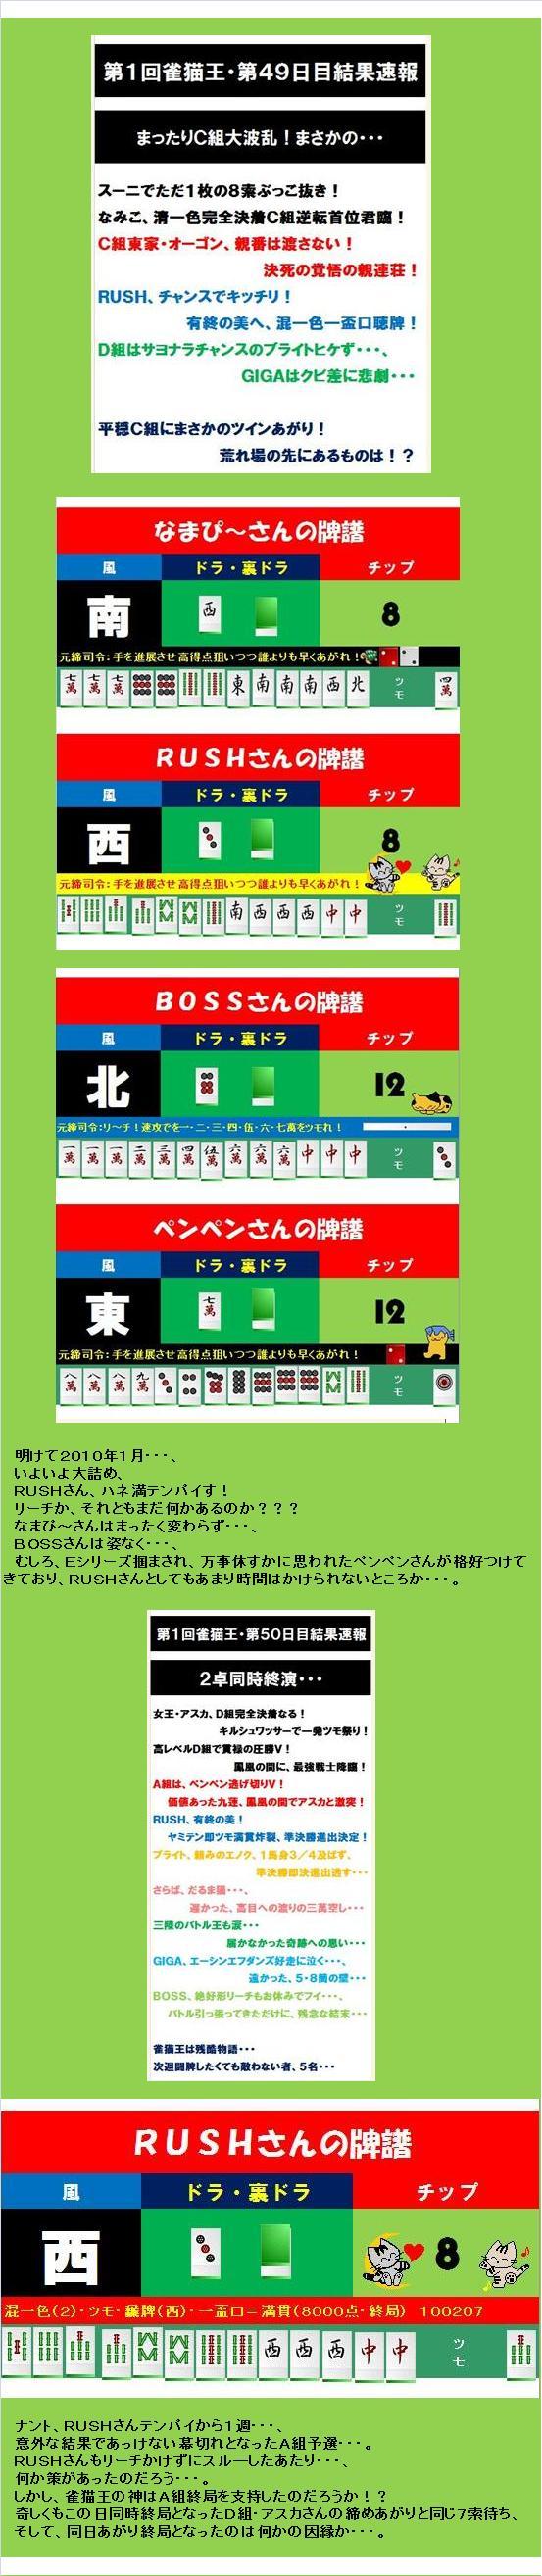 20100226・A組回顧21.jpg